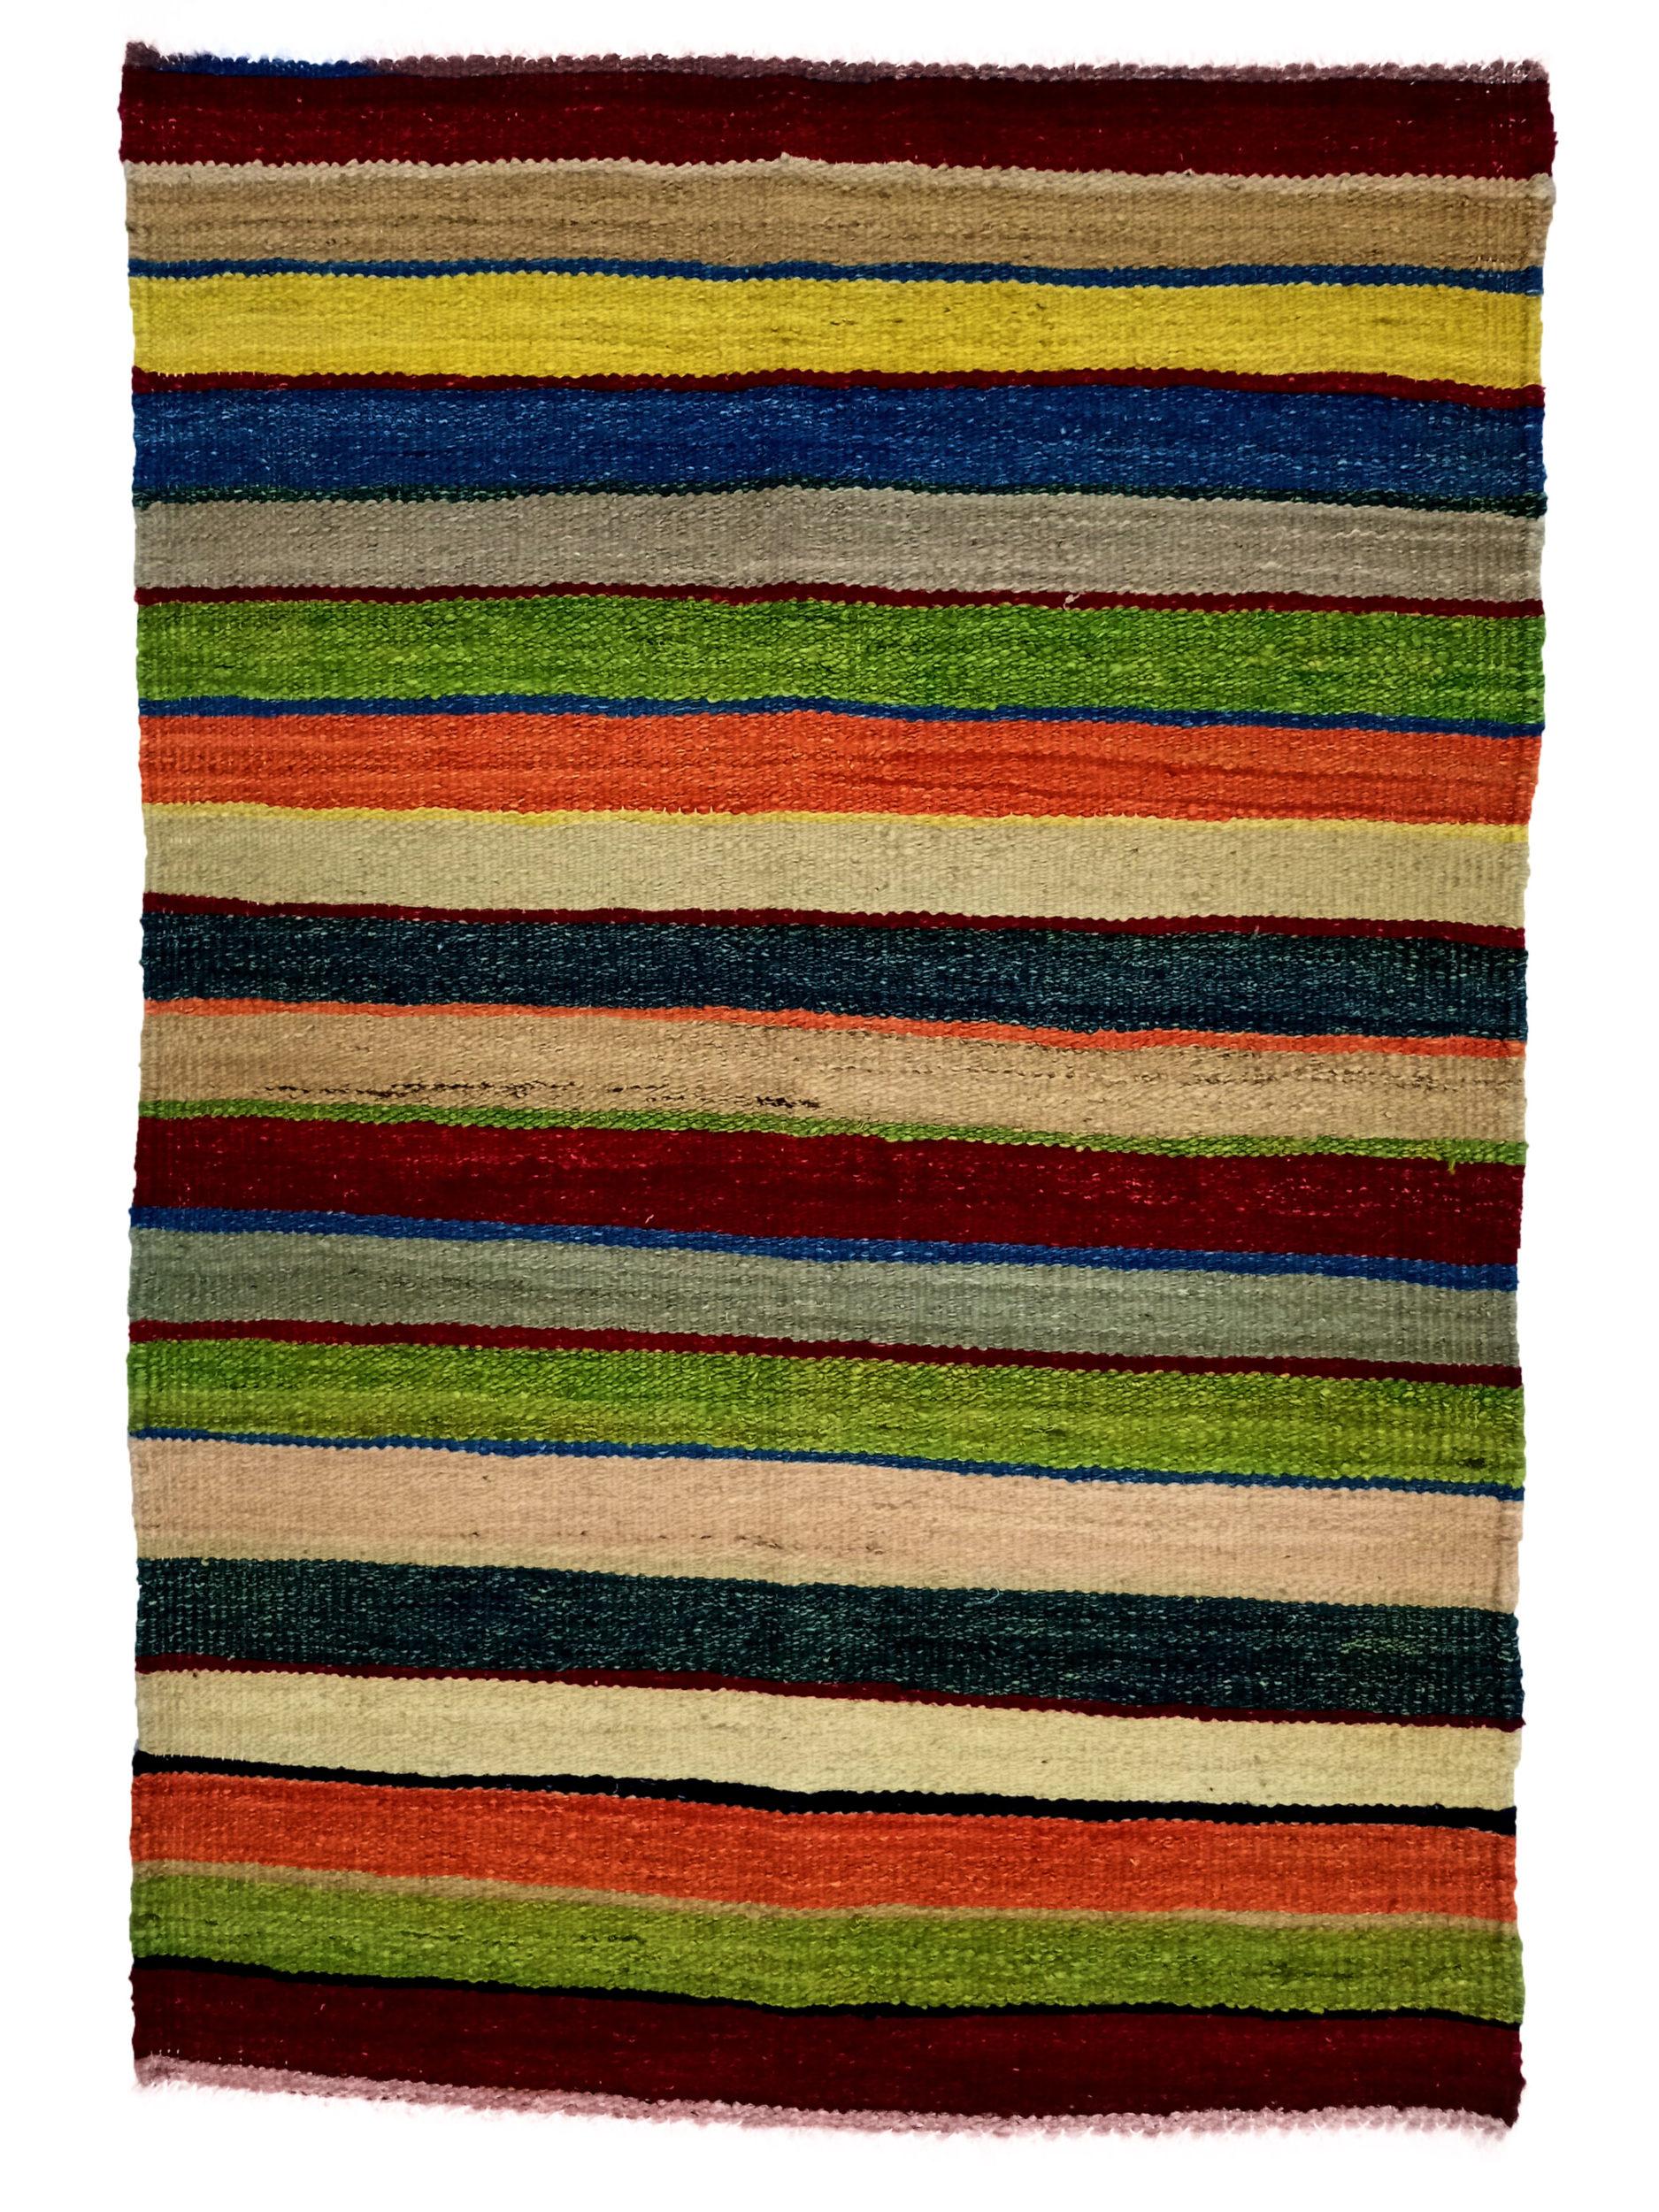 decor-rugs